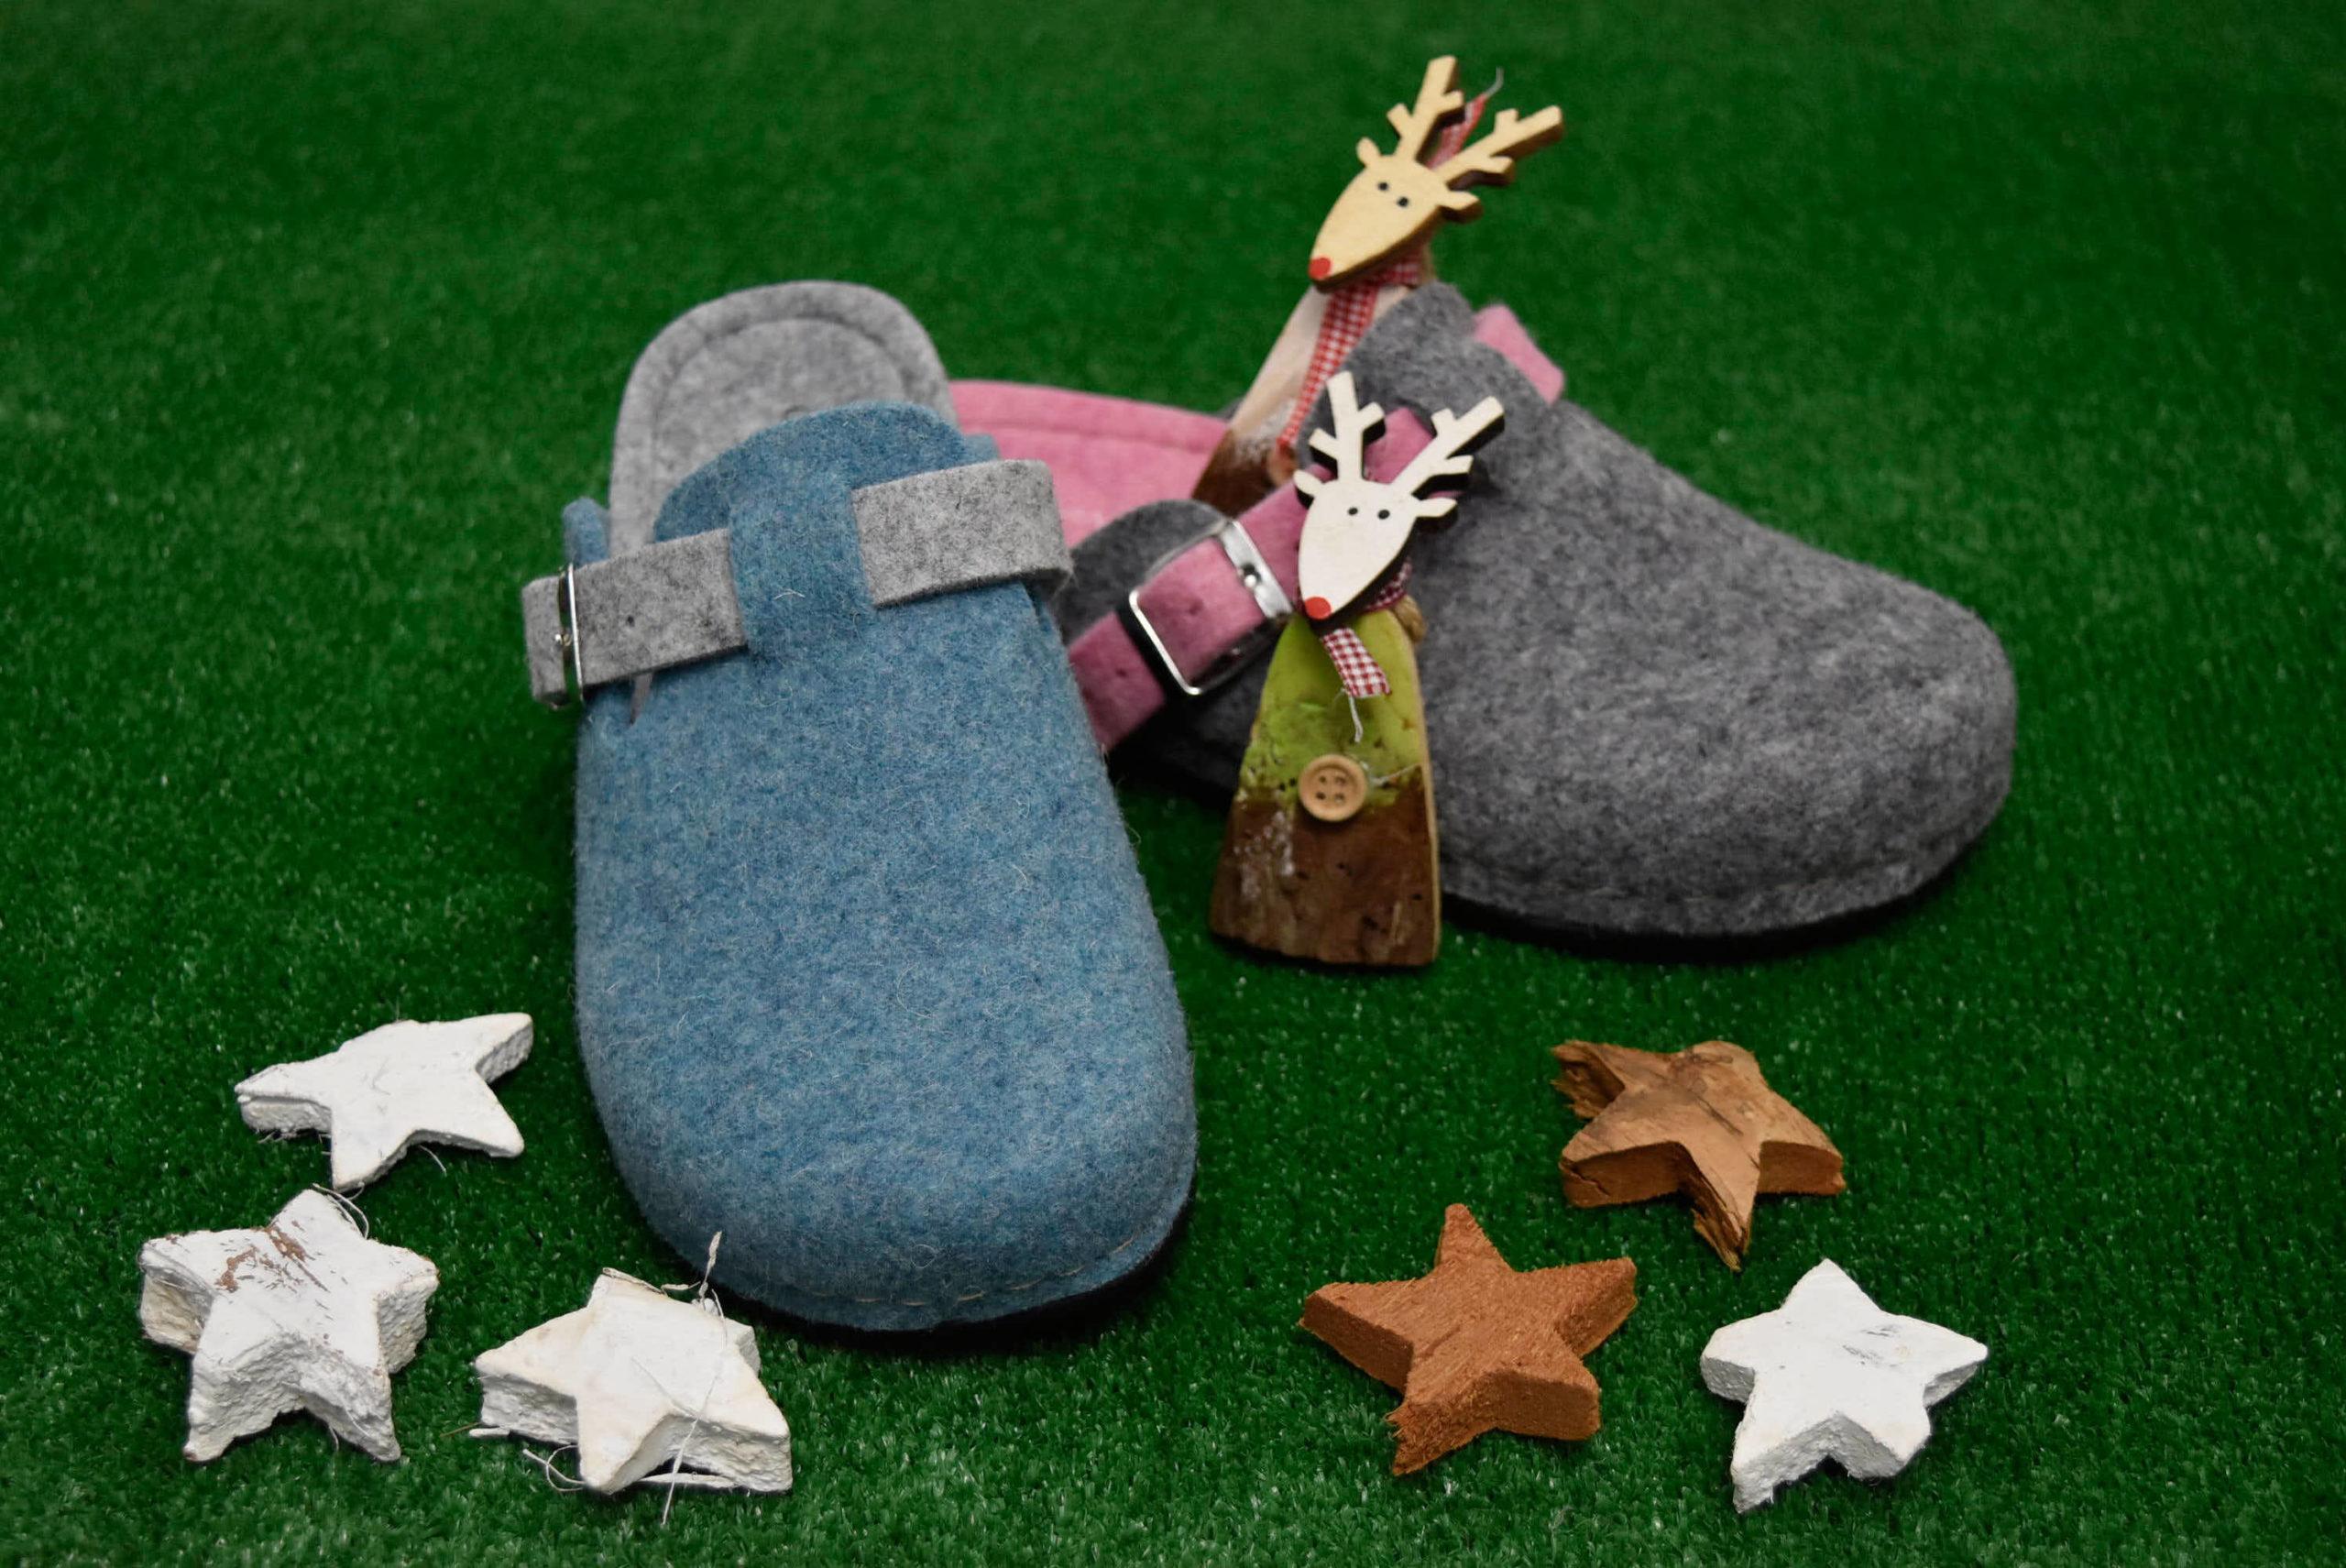 grunland ci0795 a6 grigio rosa azzurro ciabatte da donna natalizie pantofole tirolesi calzature tradizionali altoatesine feltro lana cotta idea regalo